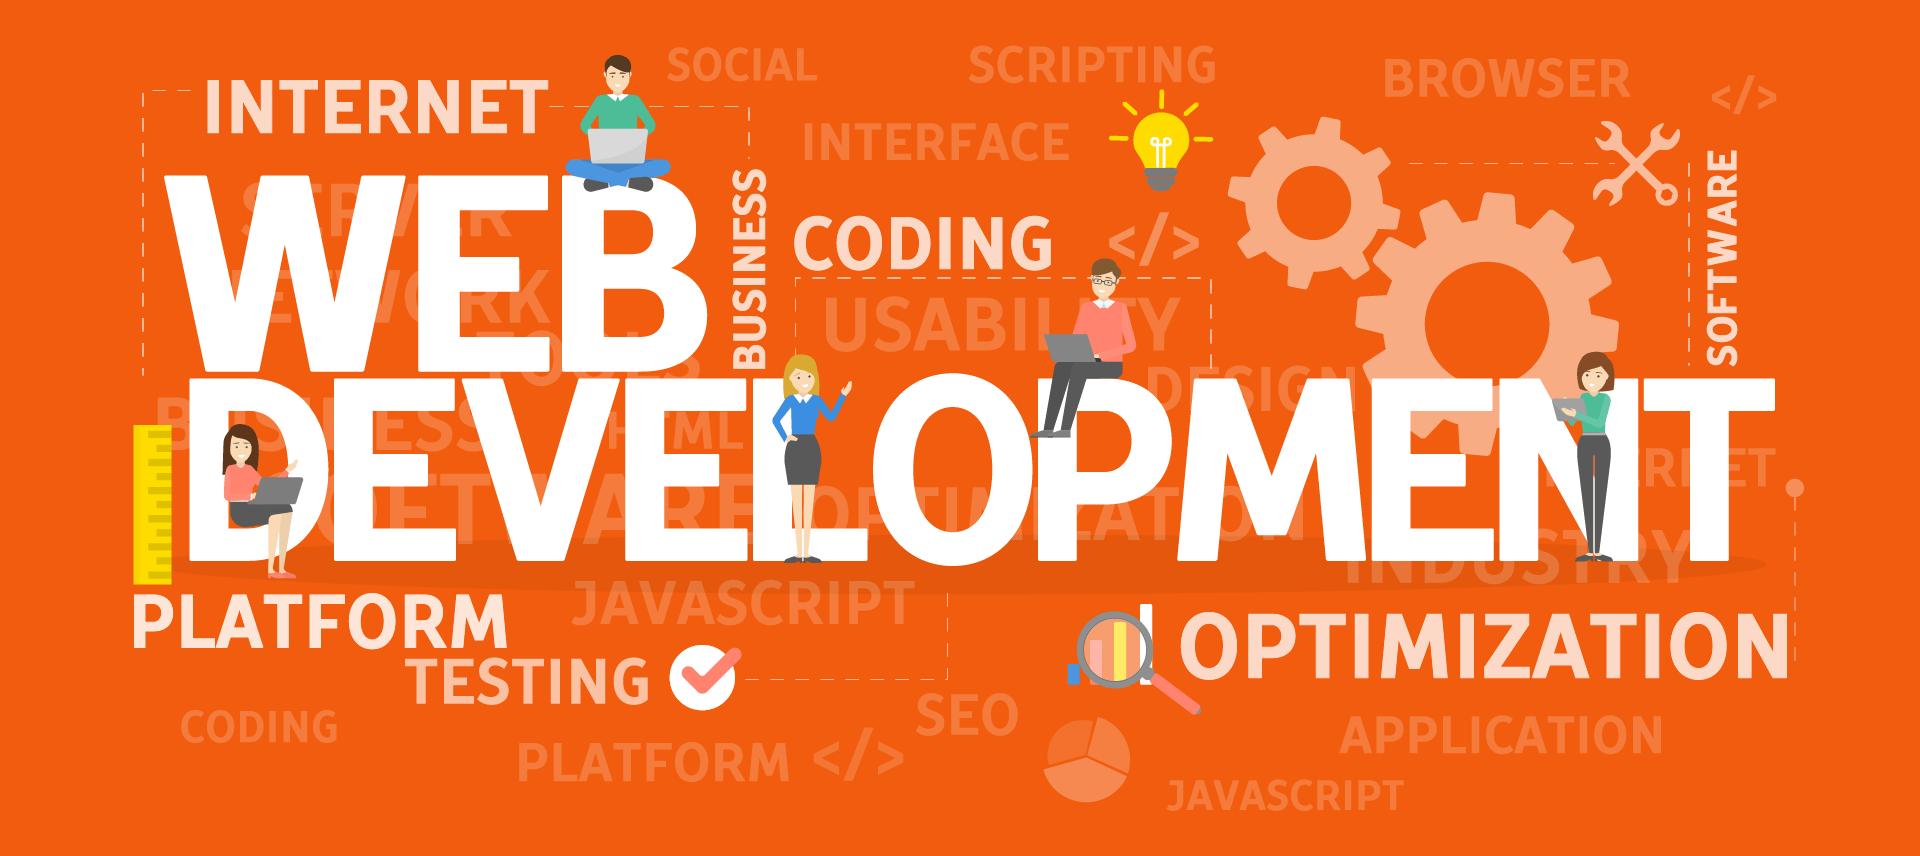 Image of website being built